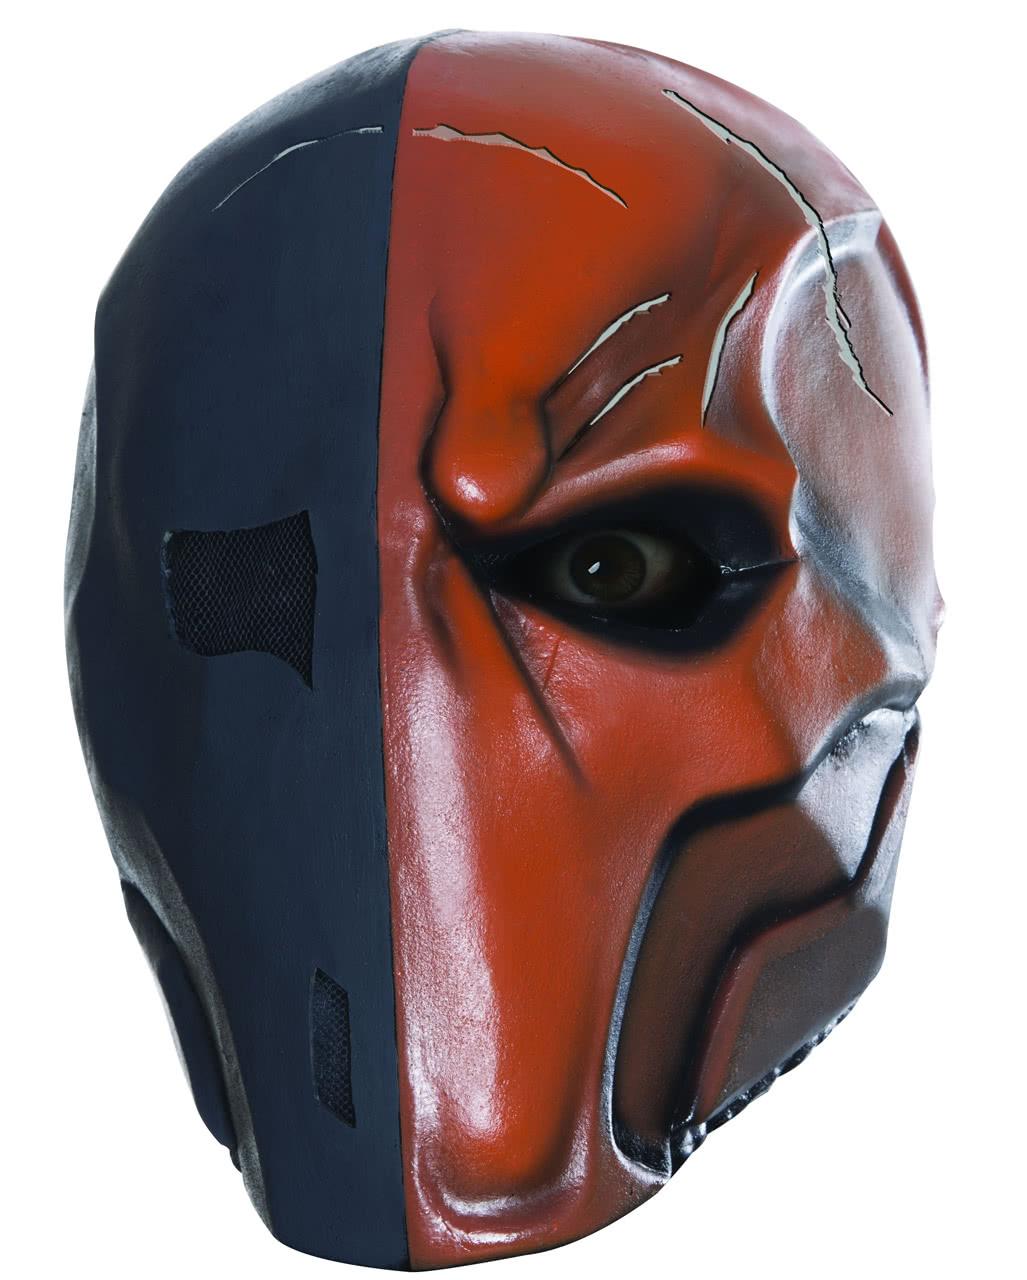 Deathstroke Latex Maske für Karnevalskostüme